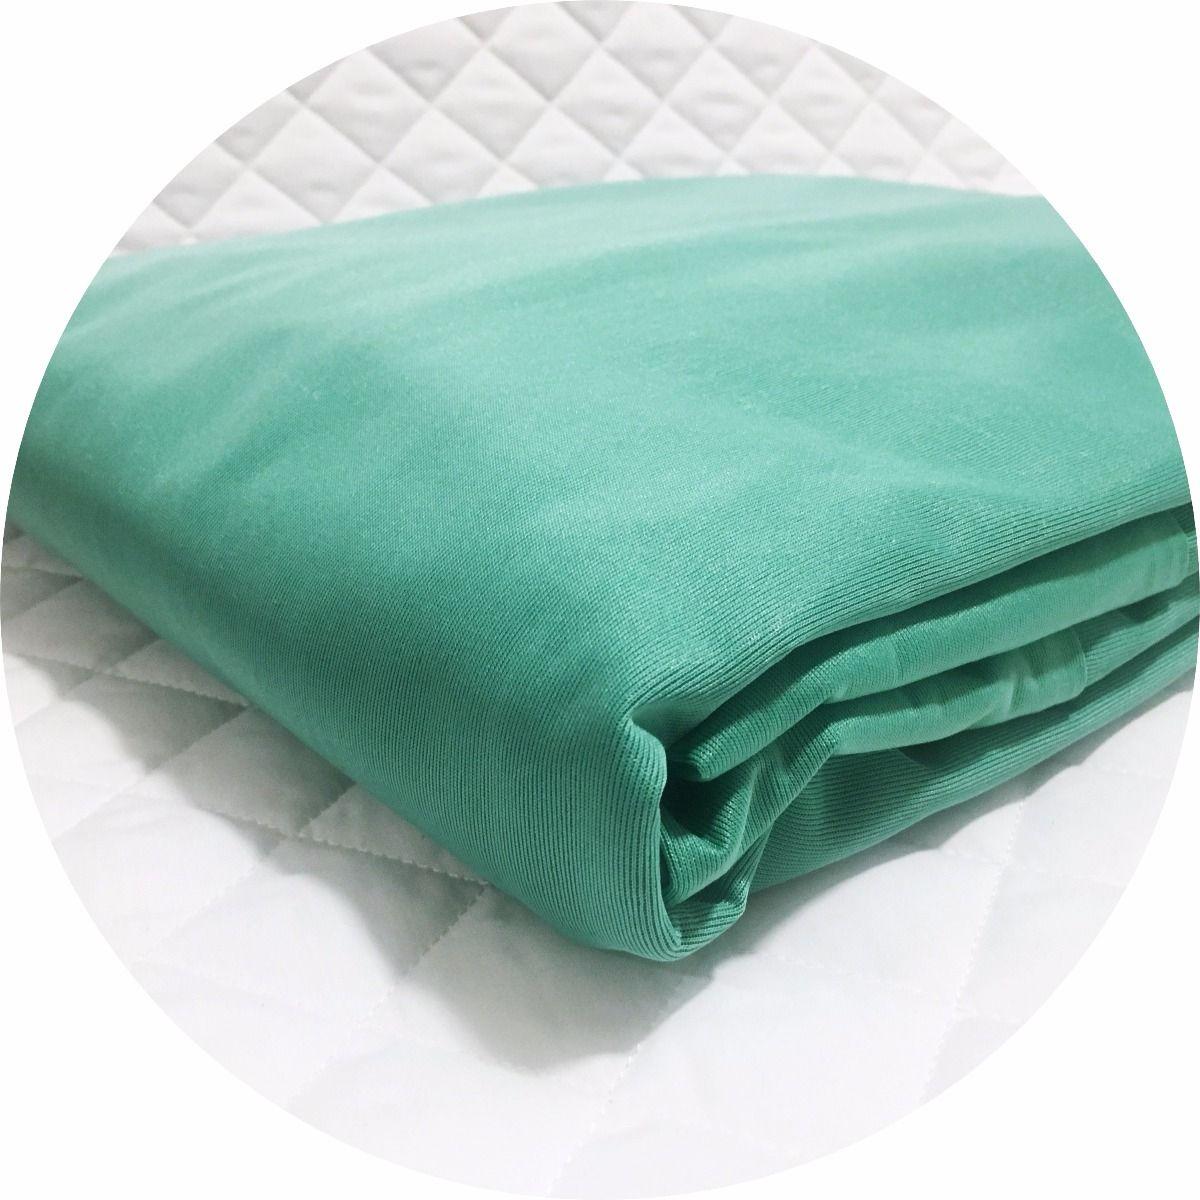 Total Enclosure Waterproof Mattress Cover Single Bed